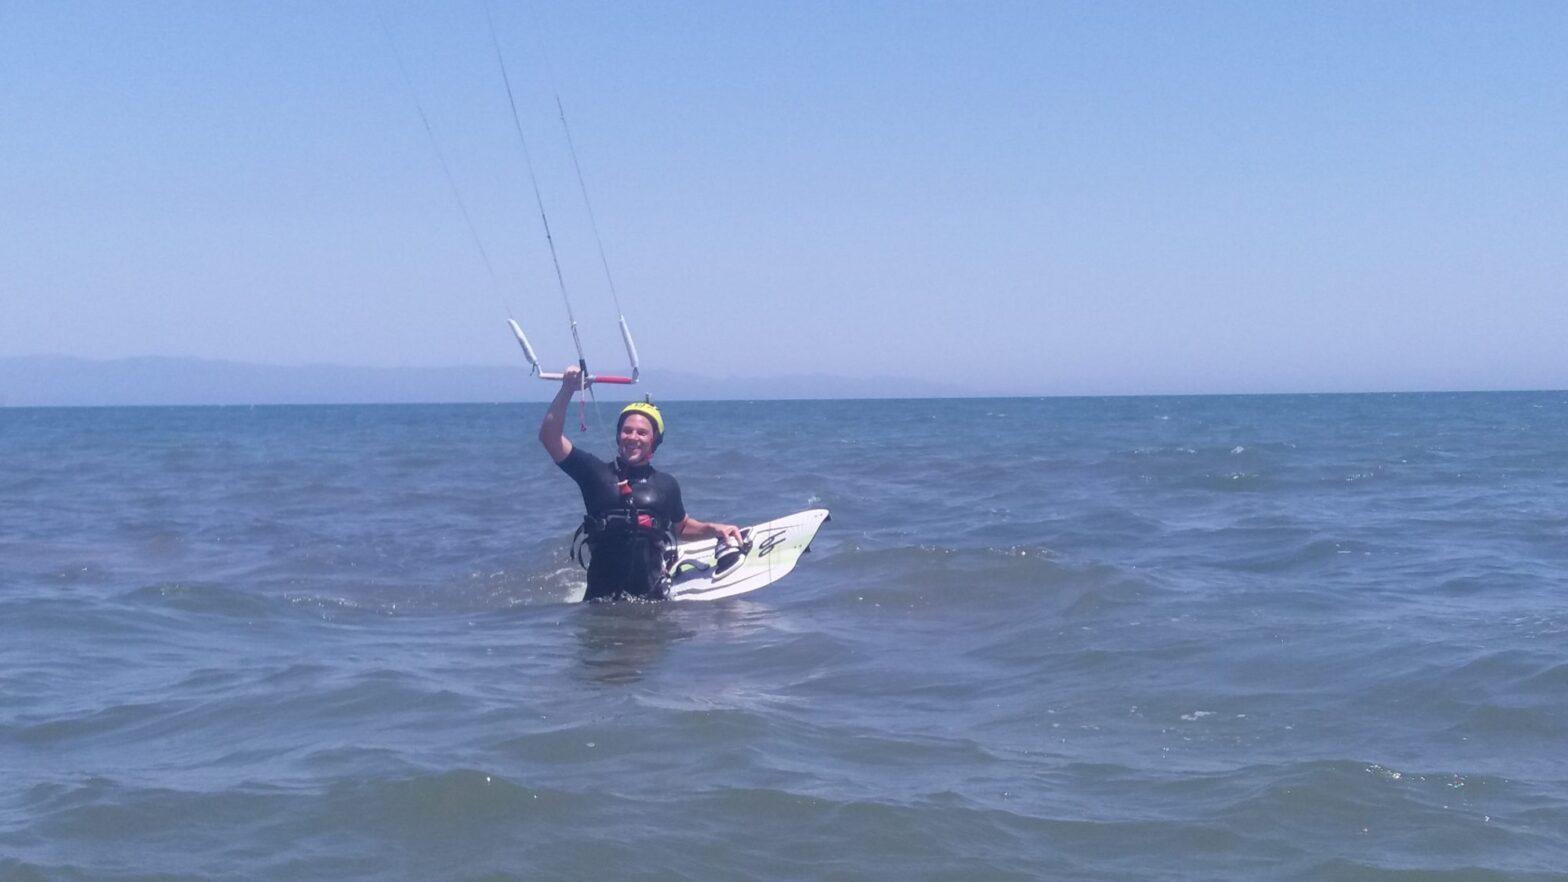 Kitesurfing La Maddalena Spiaggia Sardinia: Sardinia Kitesurfing Lessons in Petrol Beach with KiteGeneration